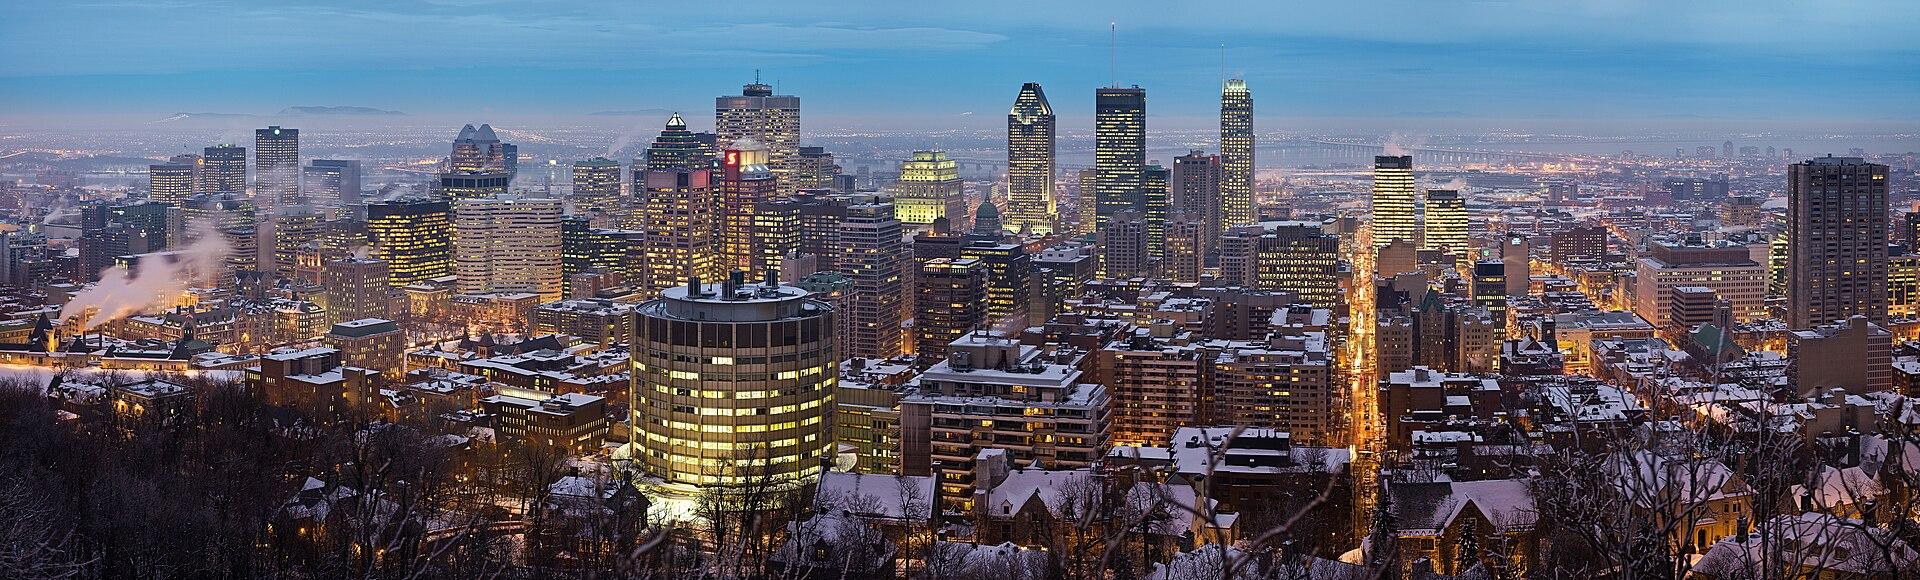 https://upload.wikimedia.org/wikipedia/commons/thumb/4/47/Montreal_Twilight_Panorama_2006.jpg/1920px-Montreal_Twilight_Panorama_2006.jpg